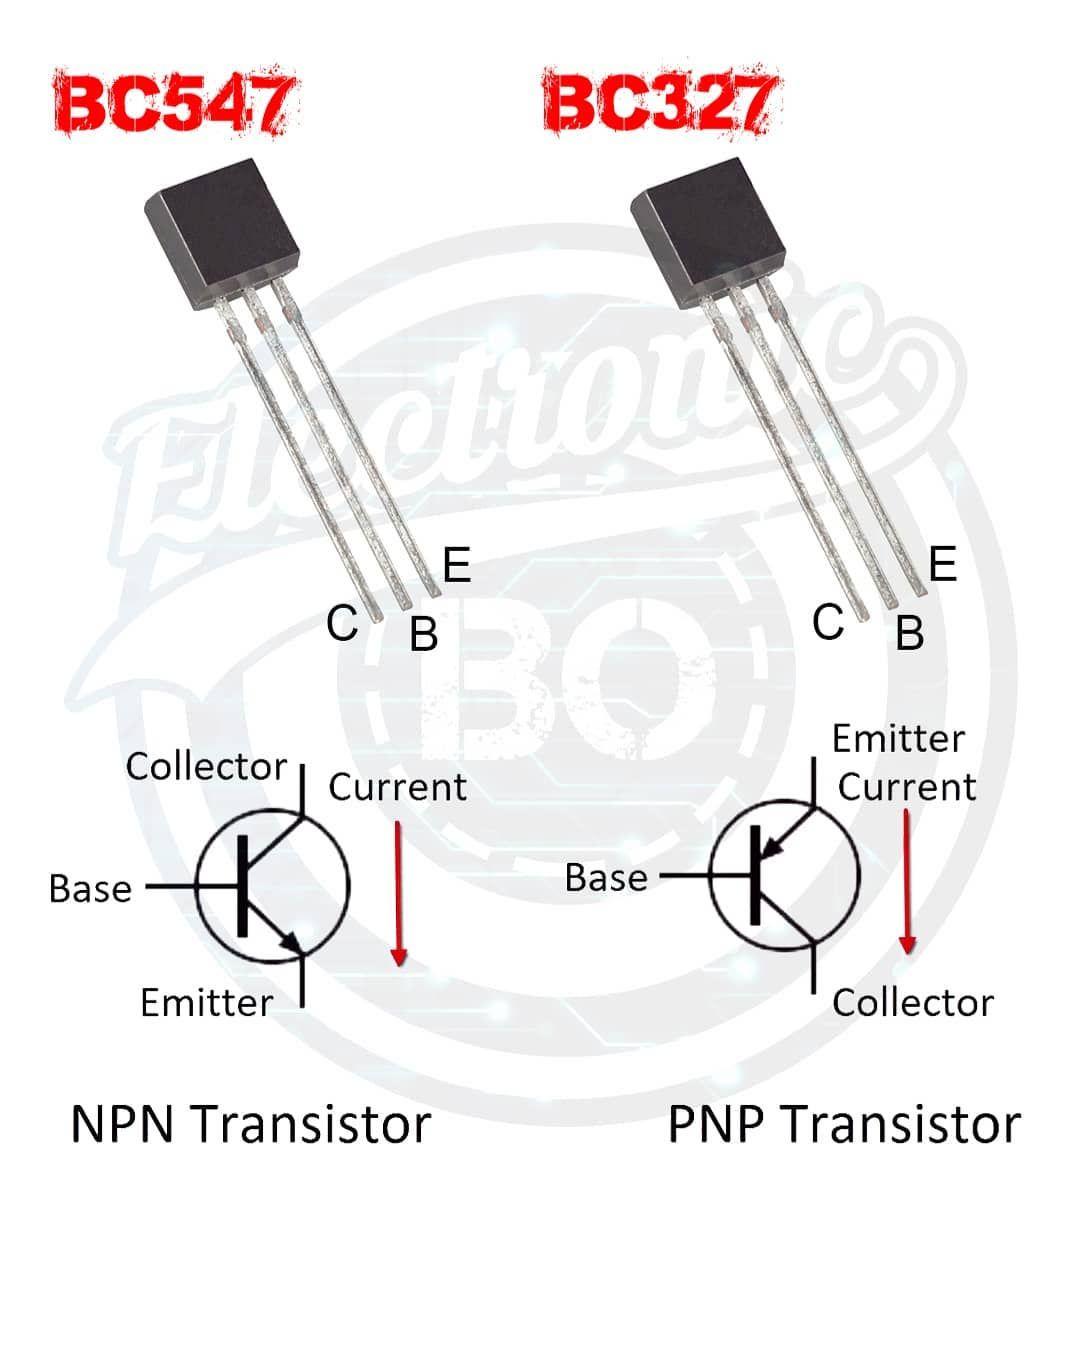 Npn And Pnp Transistor I Love My Followers